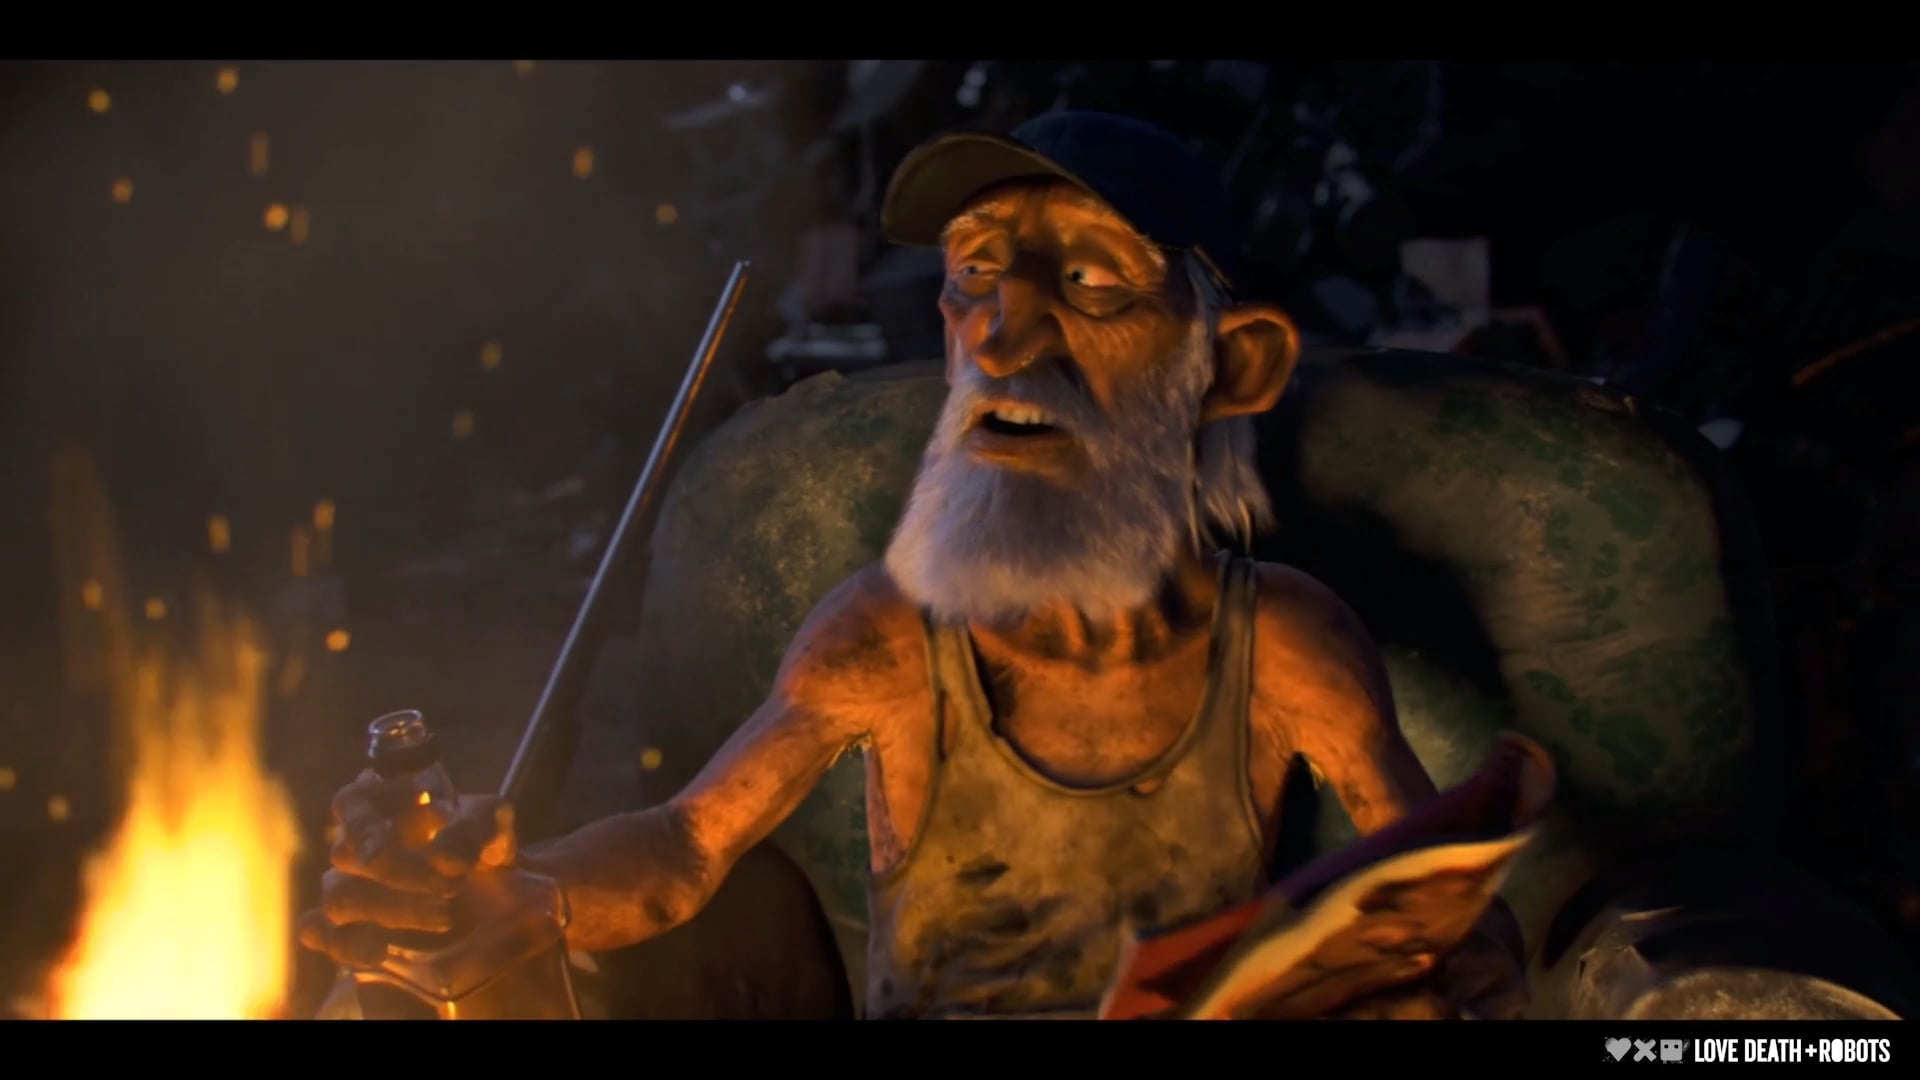 Animation reel 2019